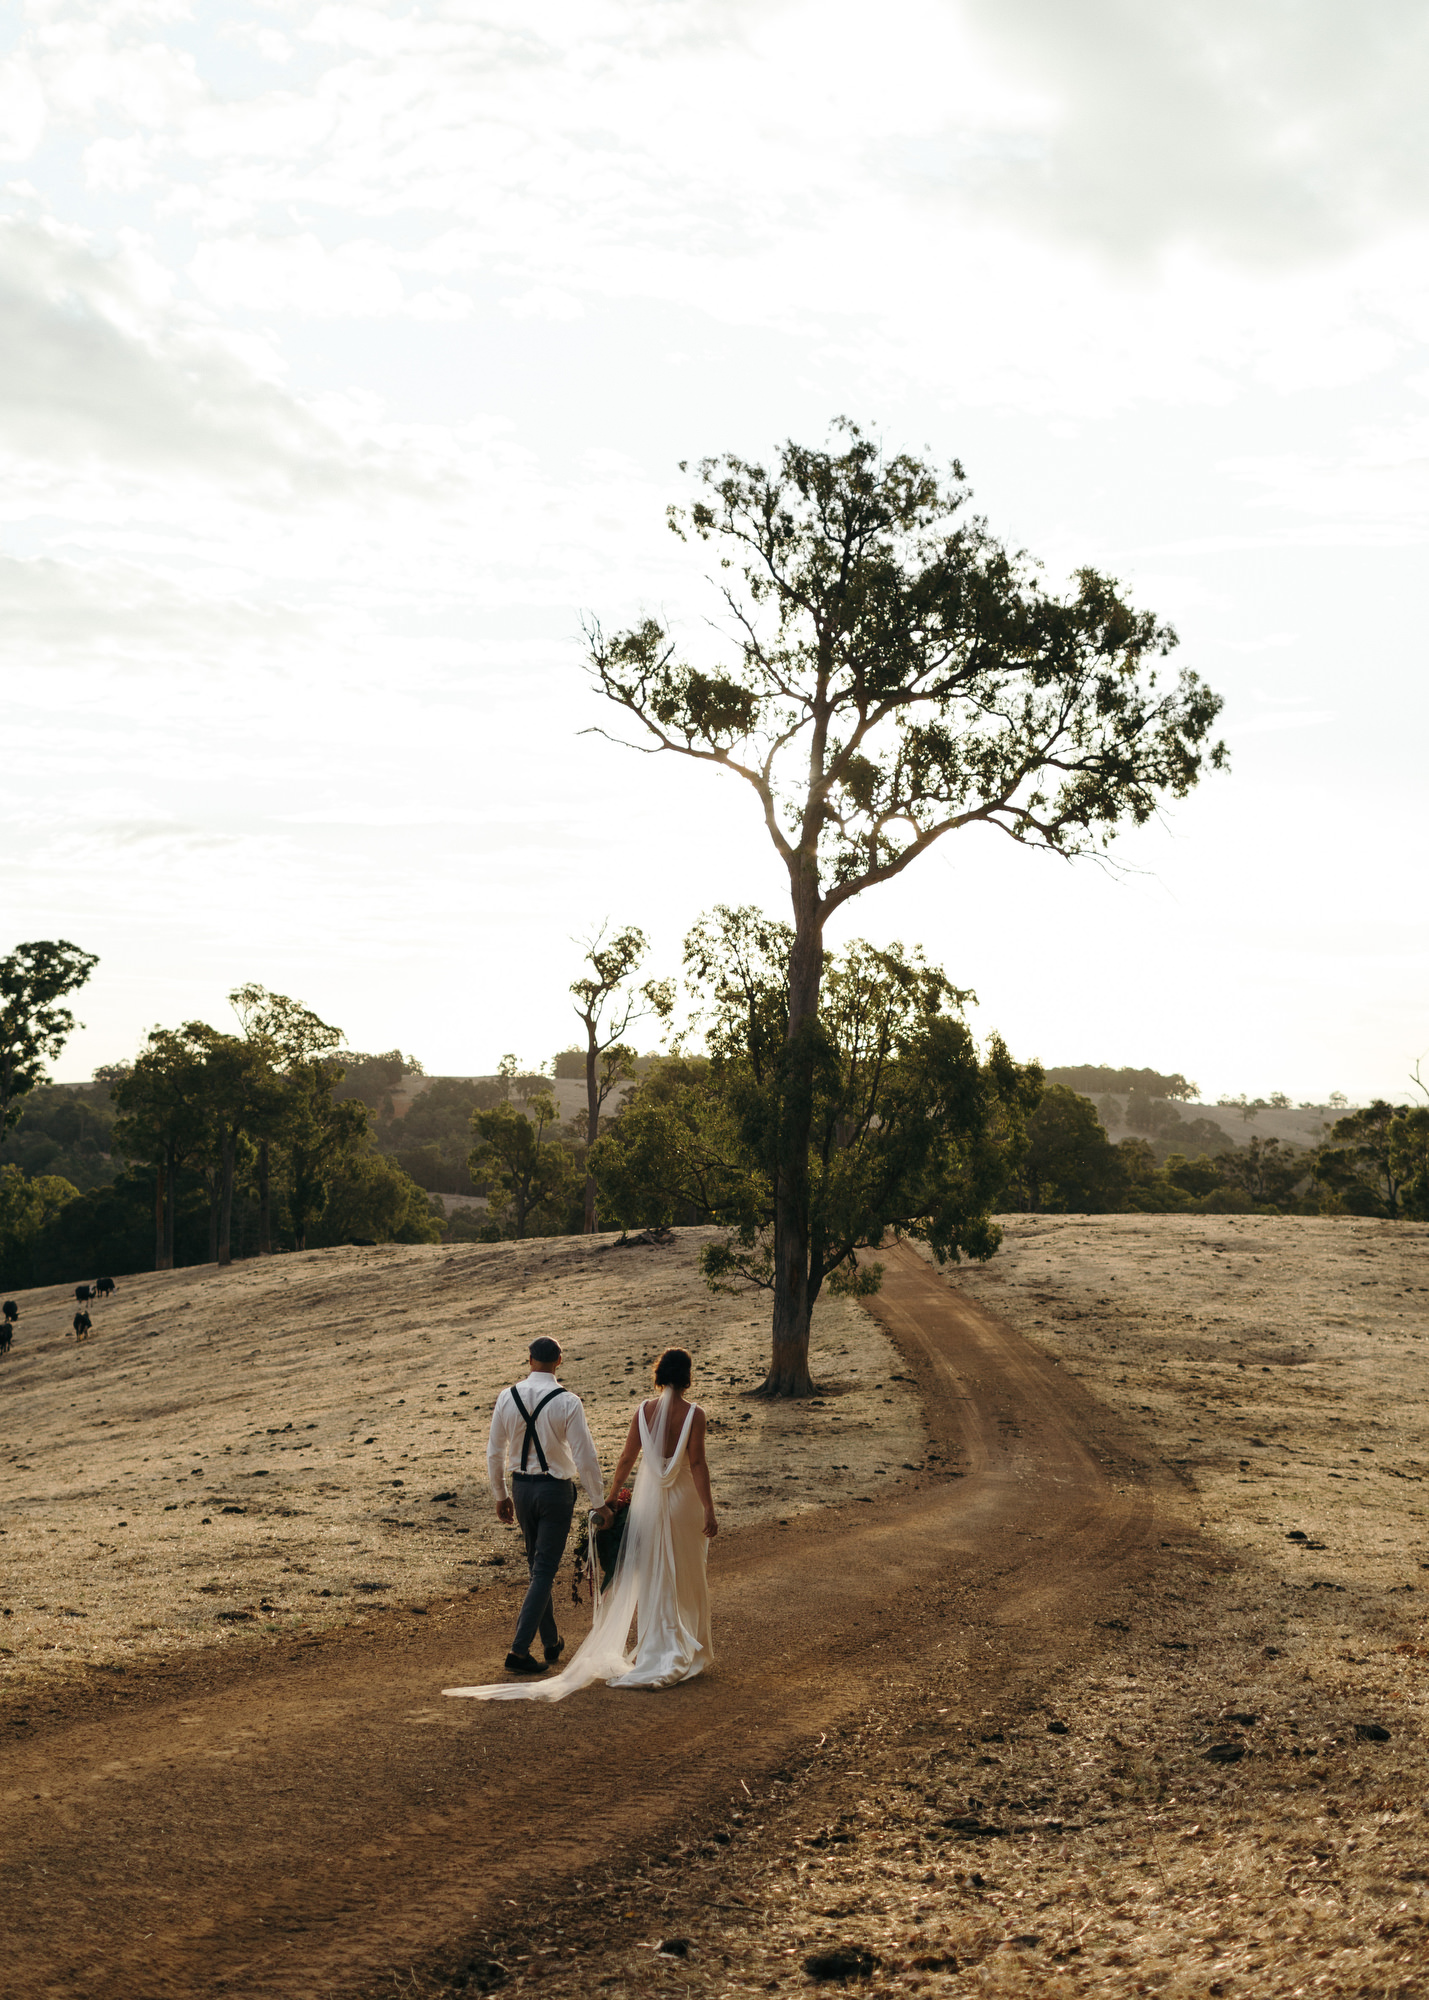 CLARK-WEDDING-EDITH-VALLEY-CARTER-ROSE-PHOTOGRAPHY-462.JPG